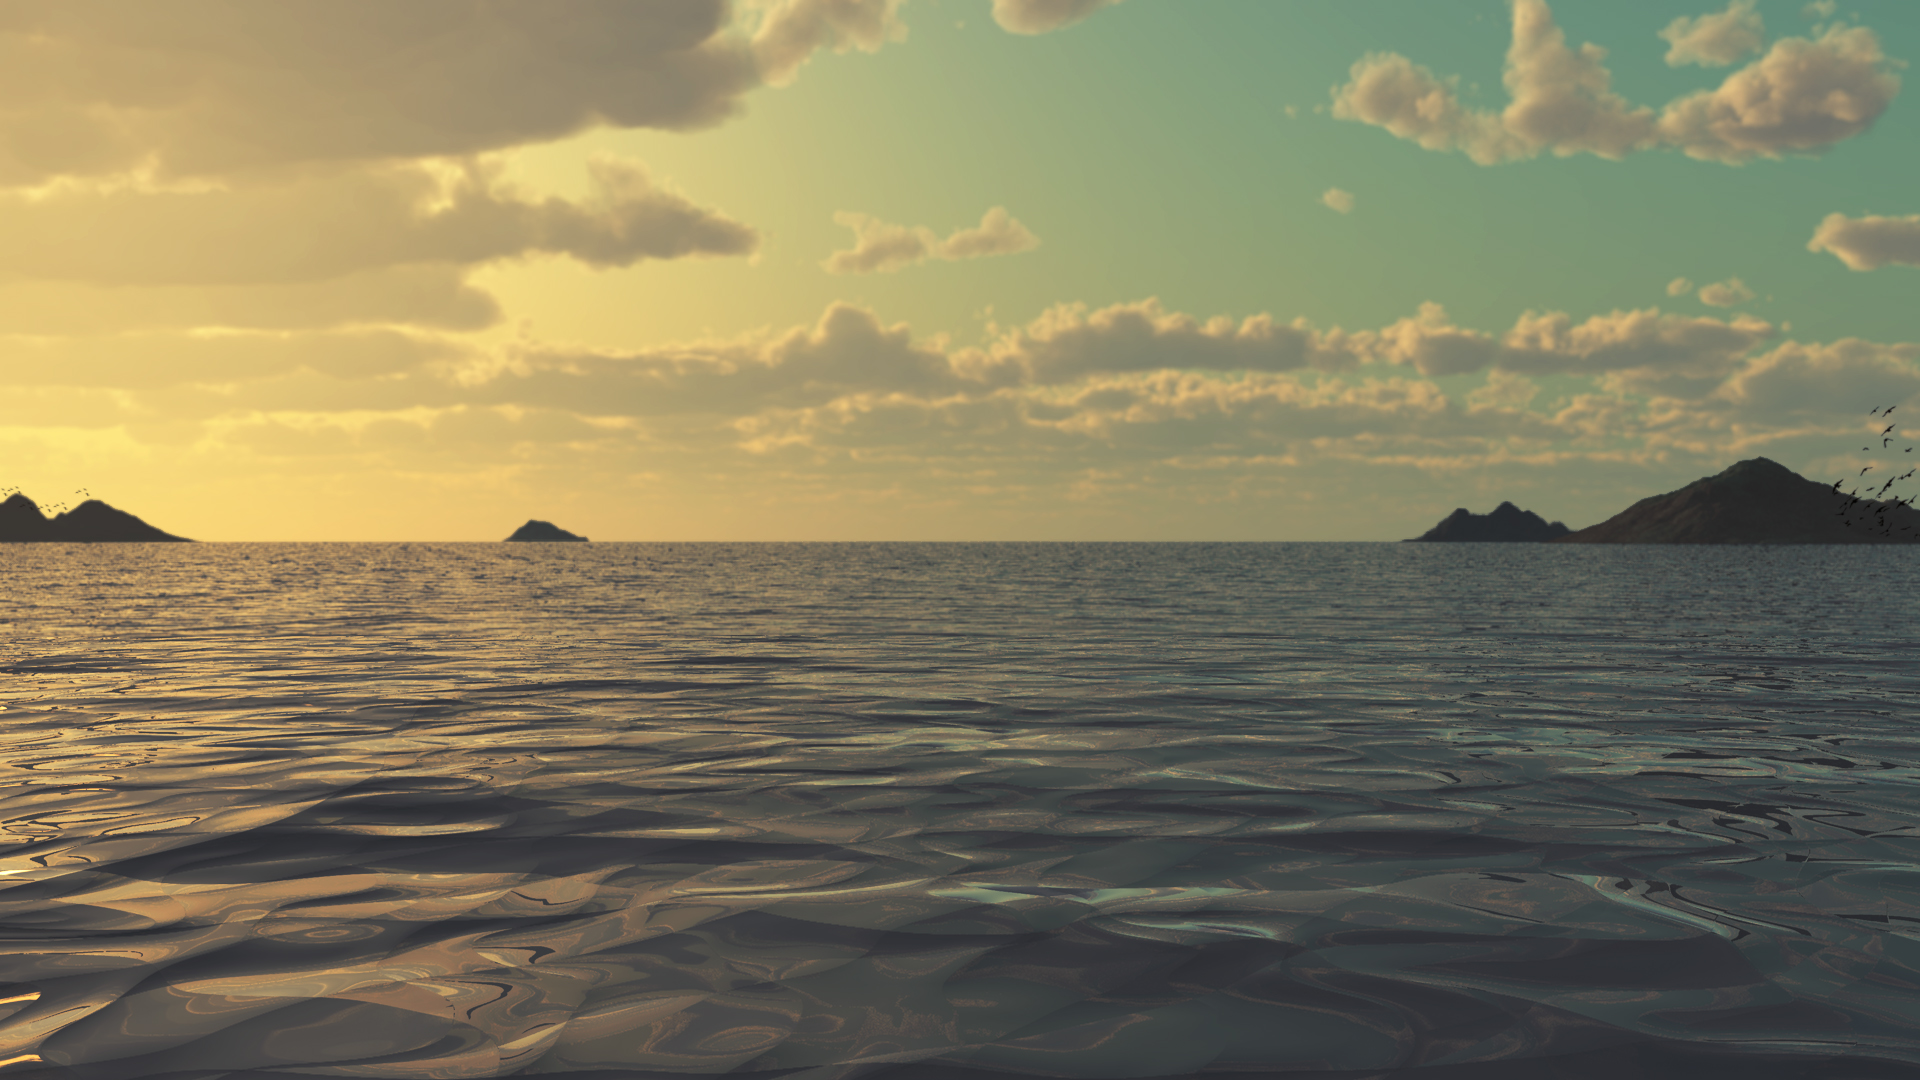 Wallpaper Ocean Scenes Wallpaper Ocean Scenes at Sunset 1920x1080